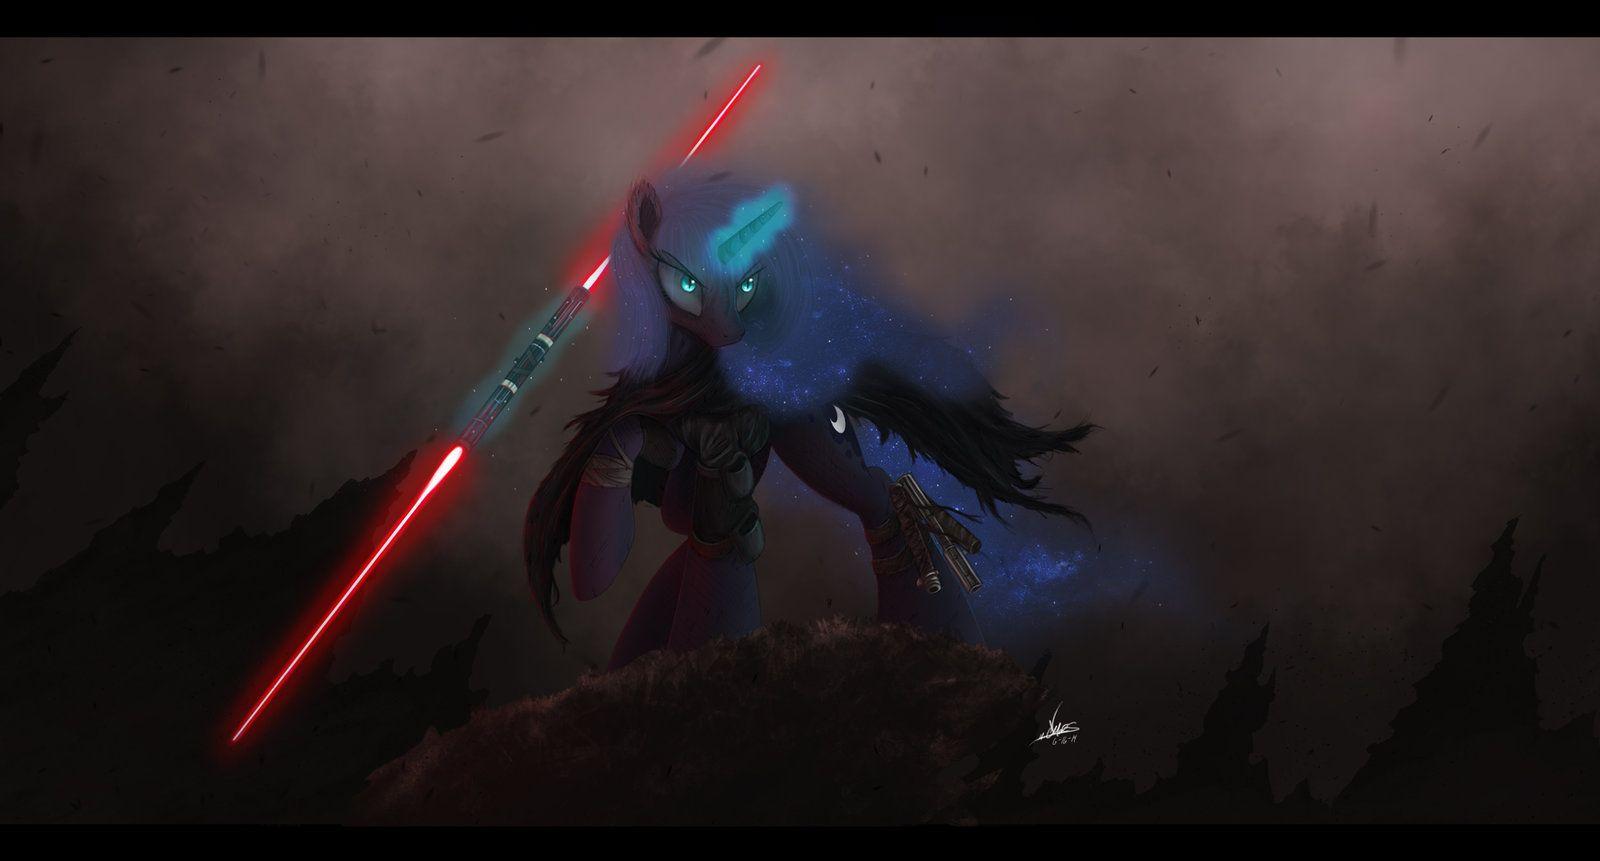 Sith Luna by NCMares on DeviantArt | Mlp, Nightmare moon, Mlp fan art